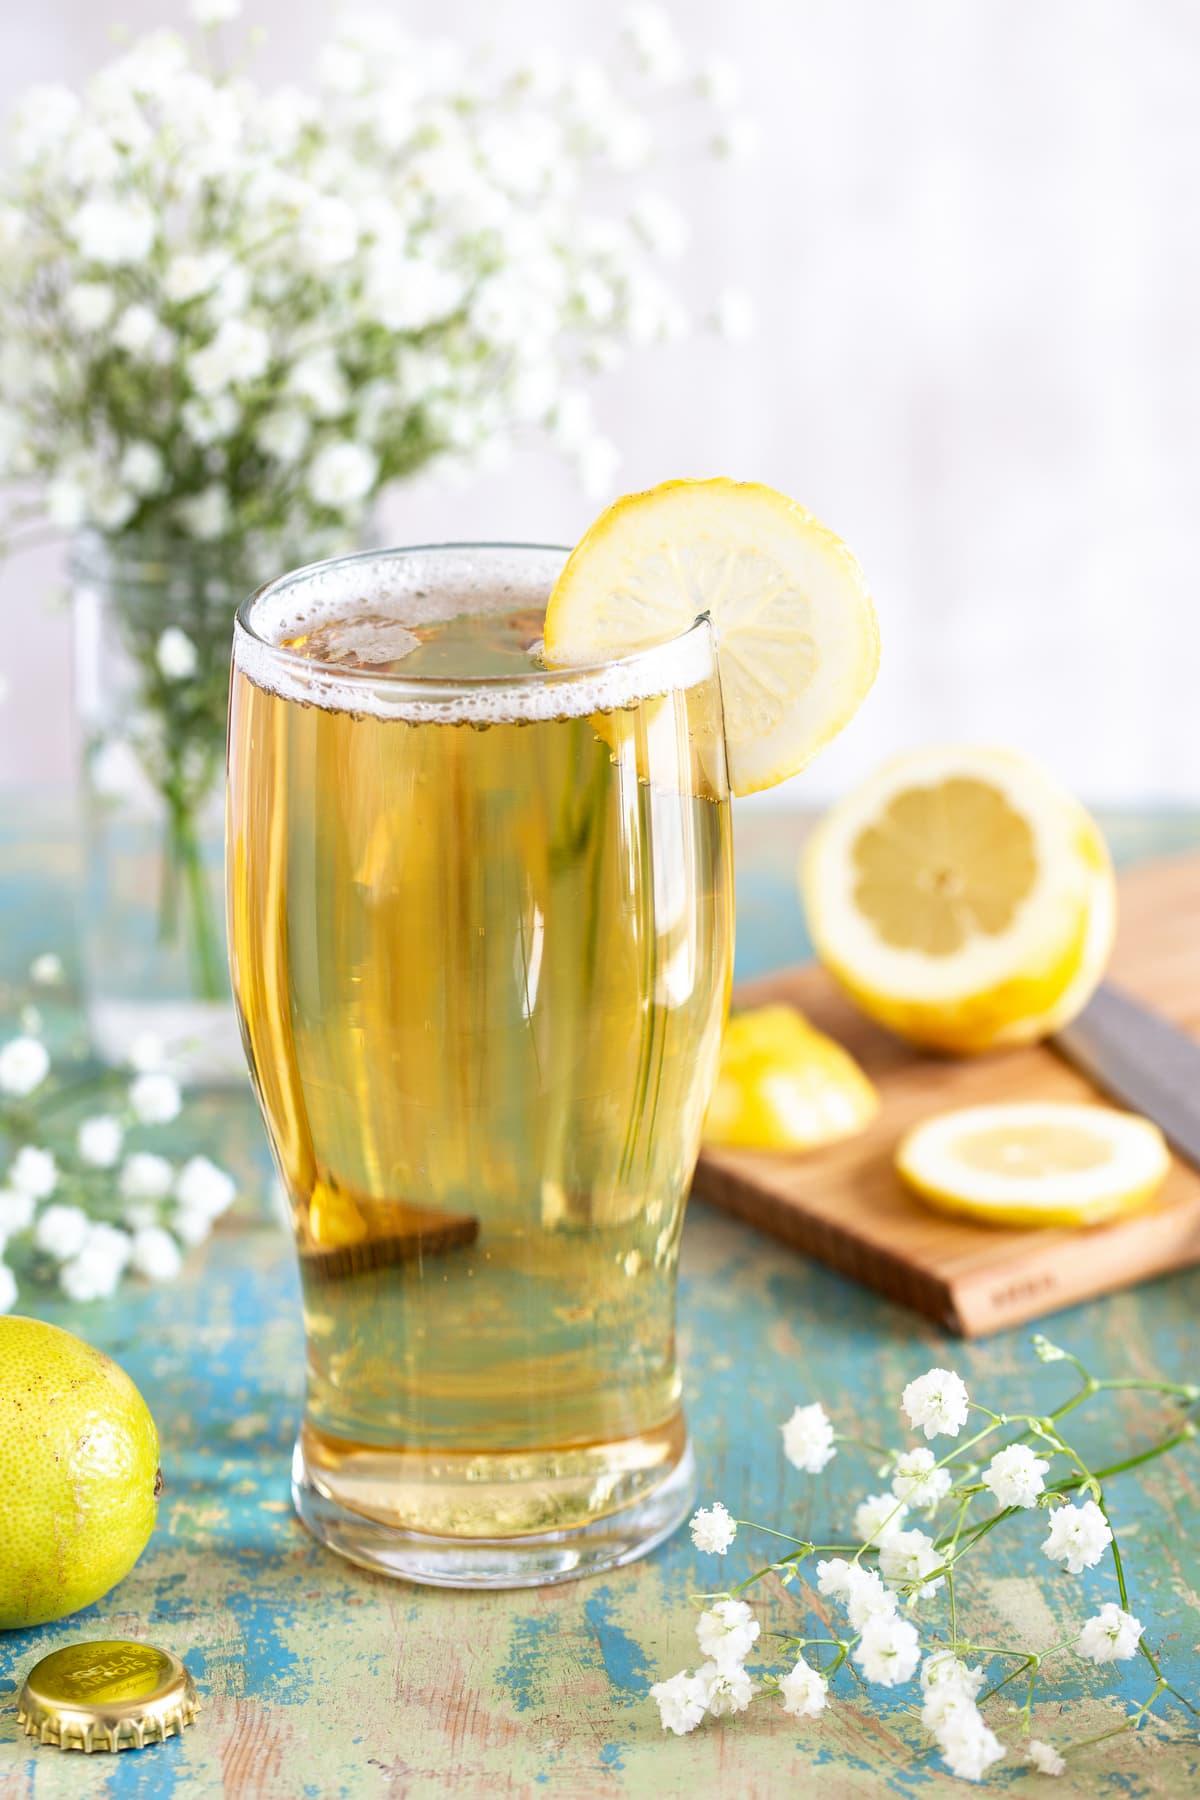 Panache served with a slice of lemon.